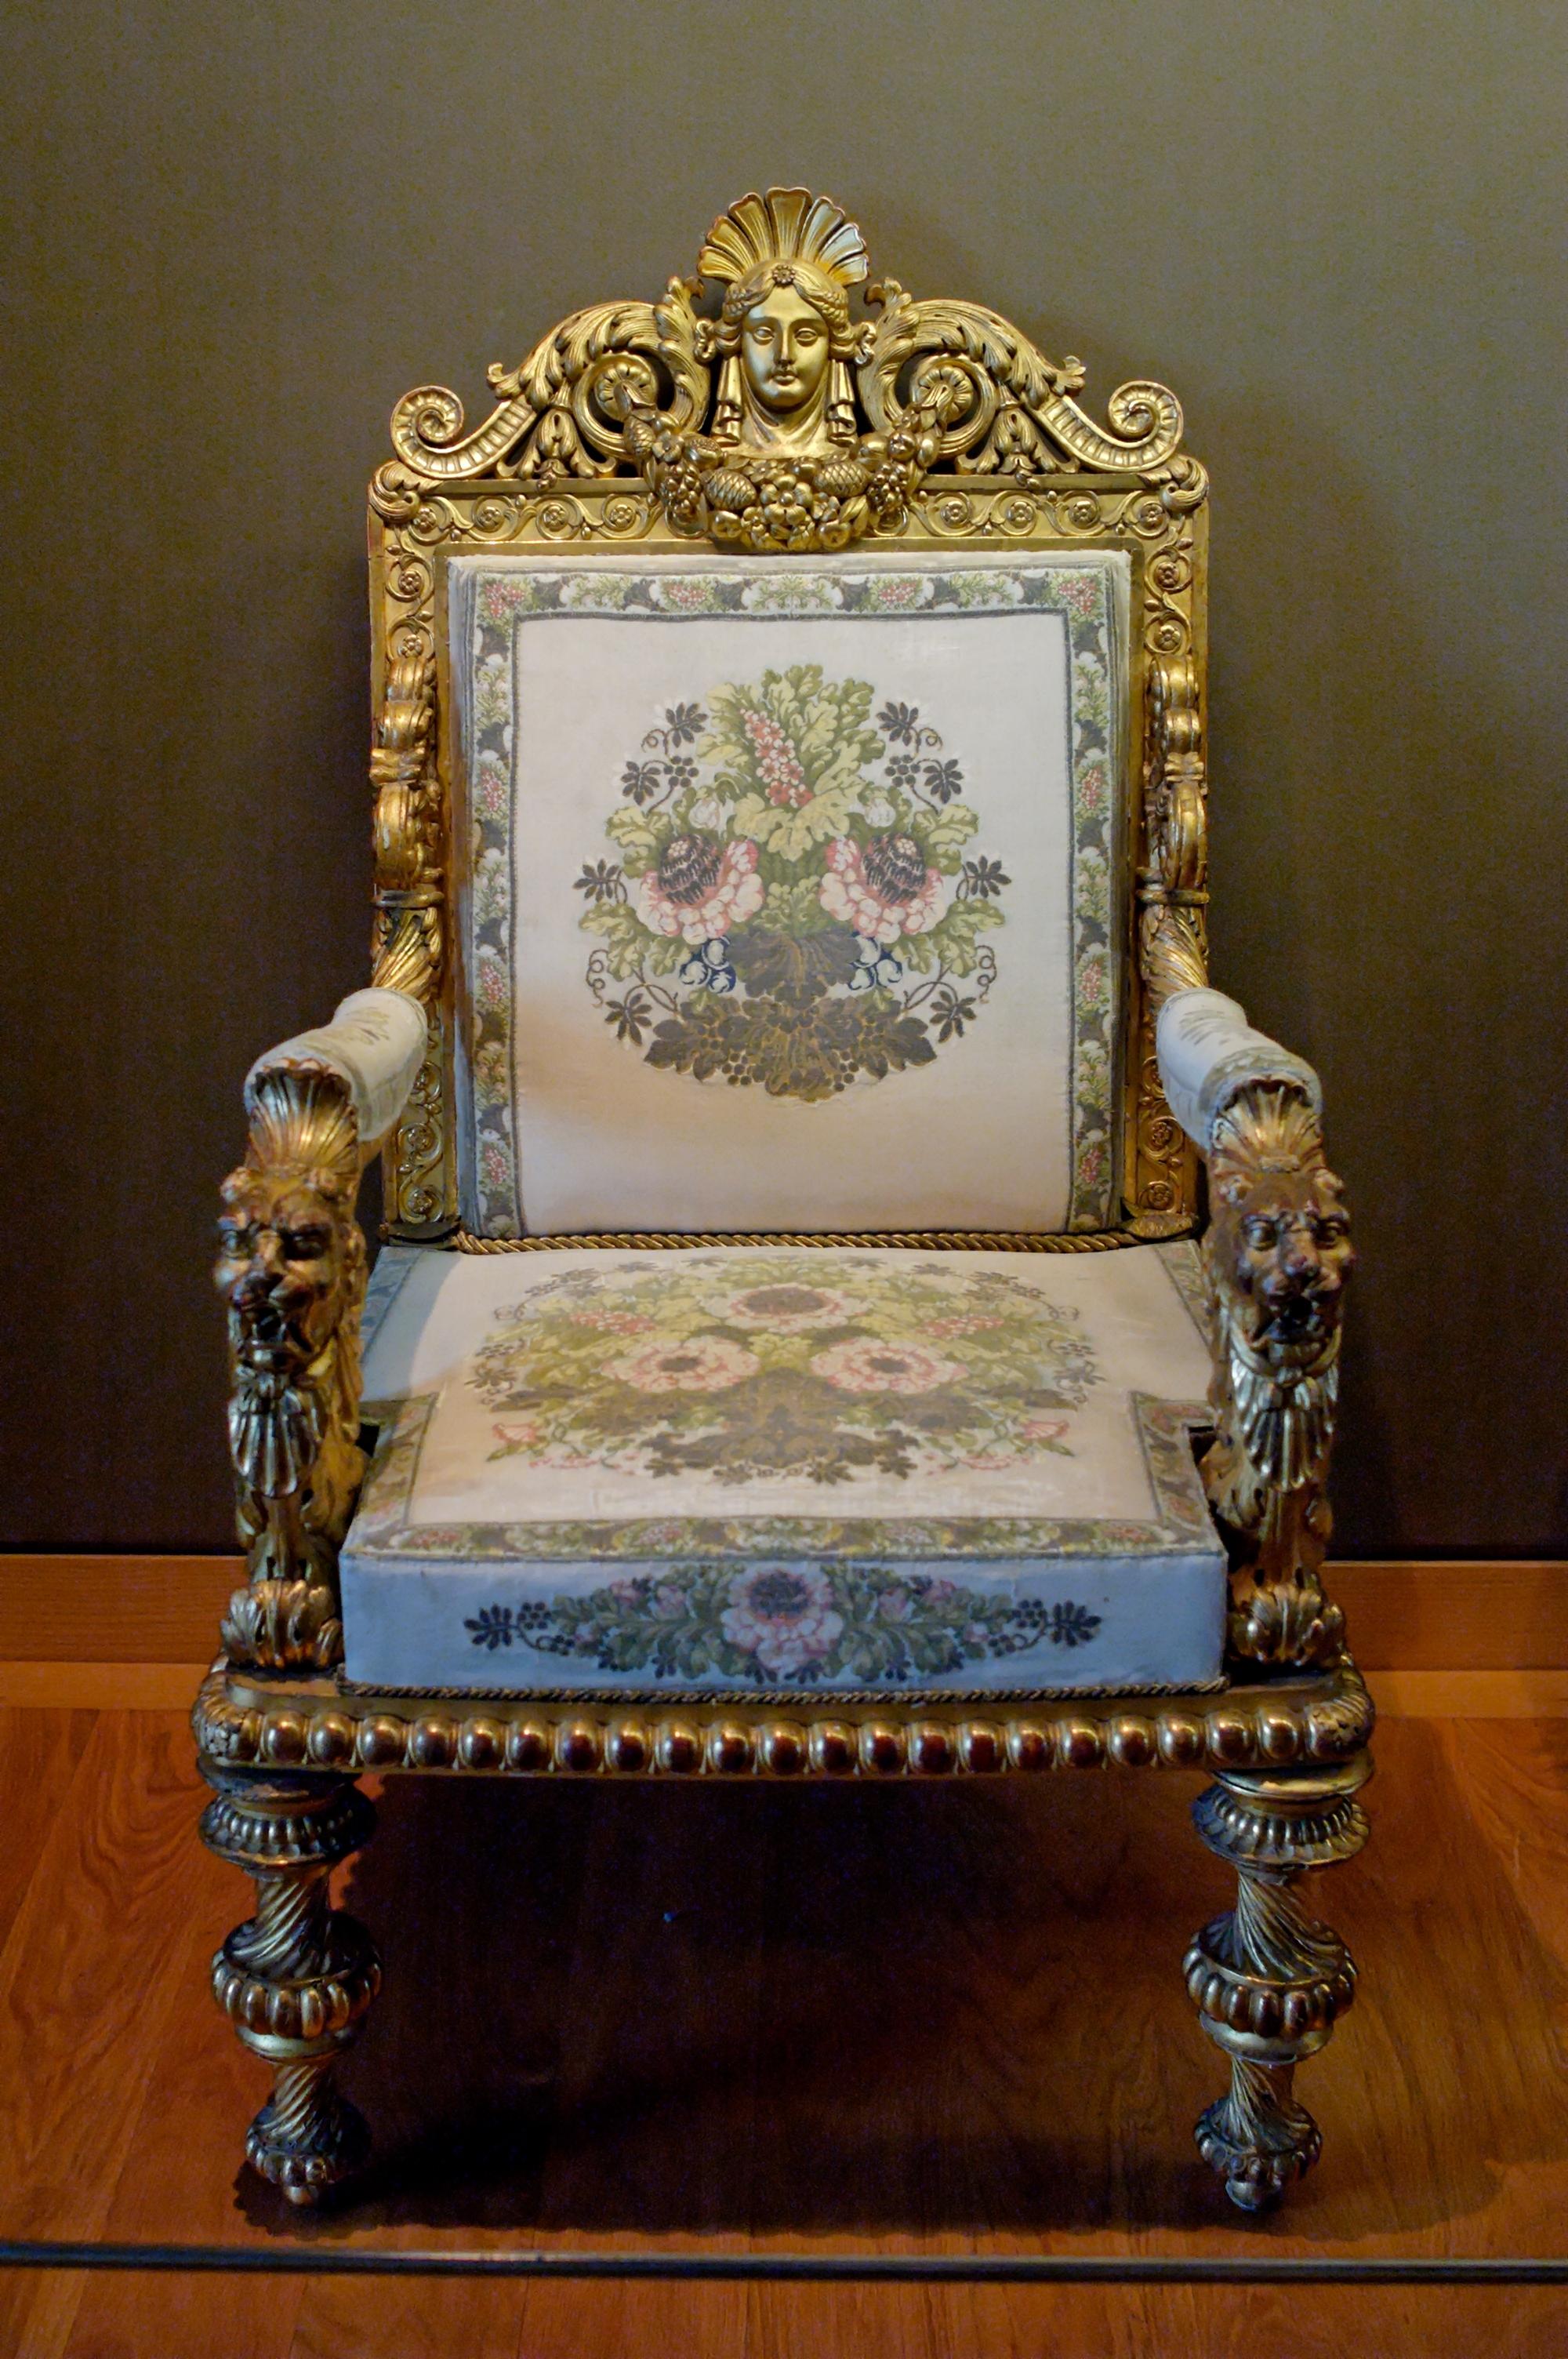 Элегантный стул в стиле ампир